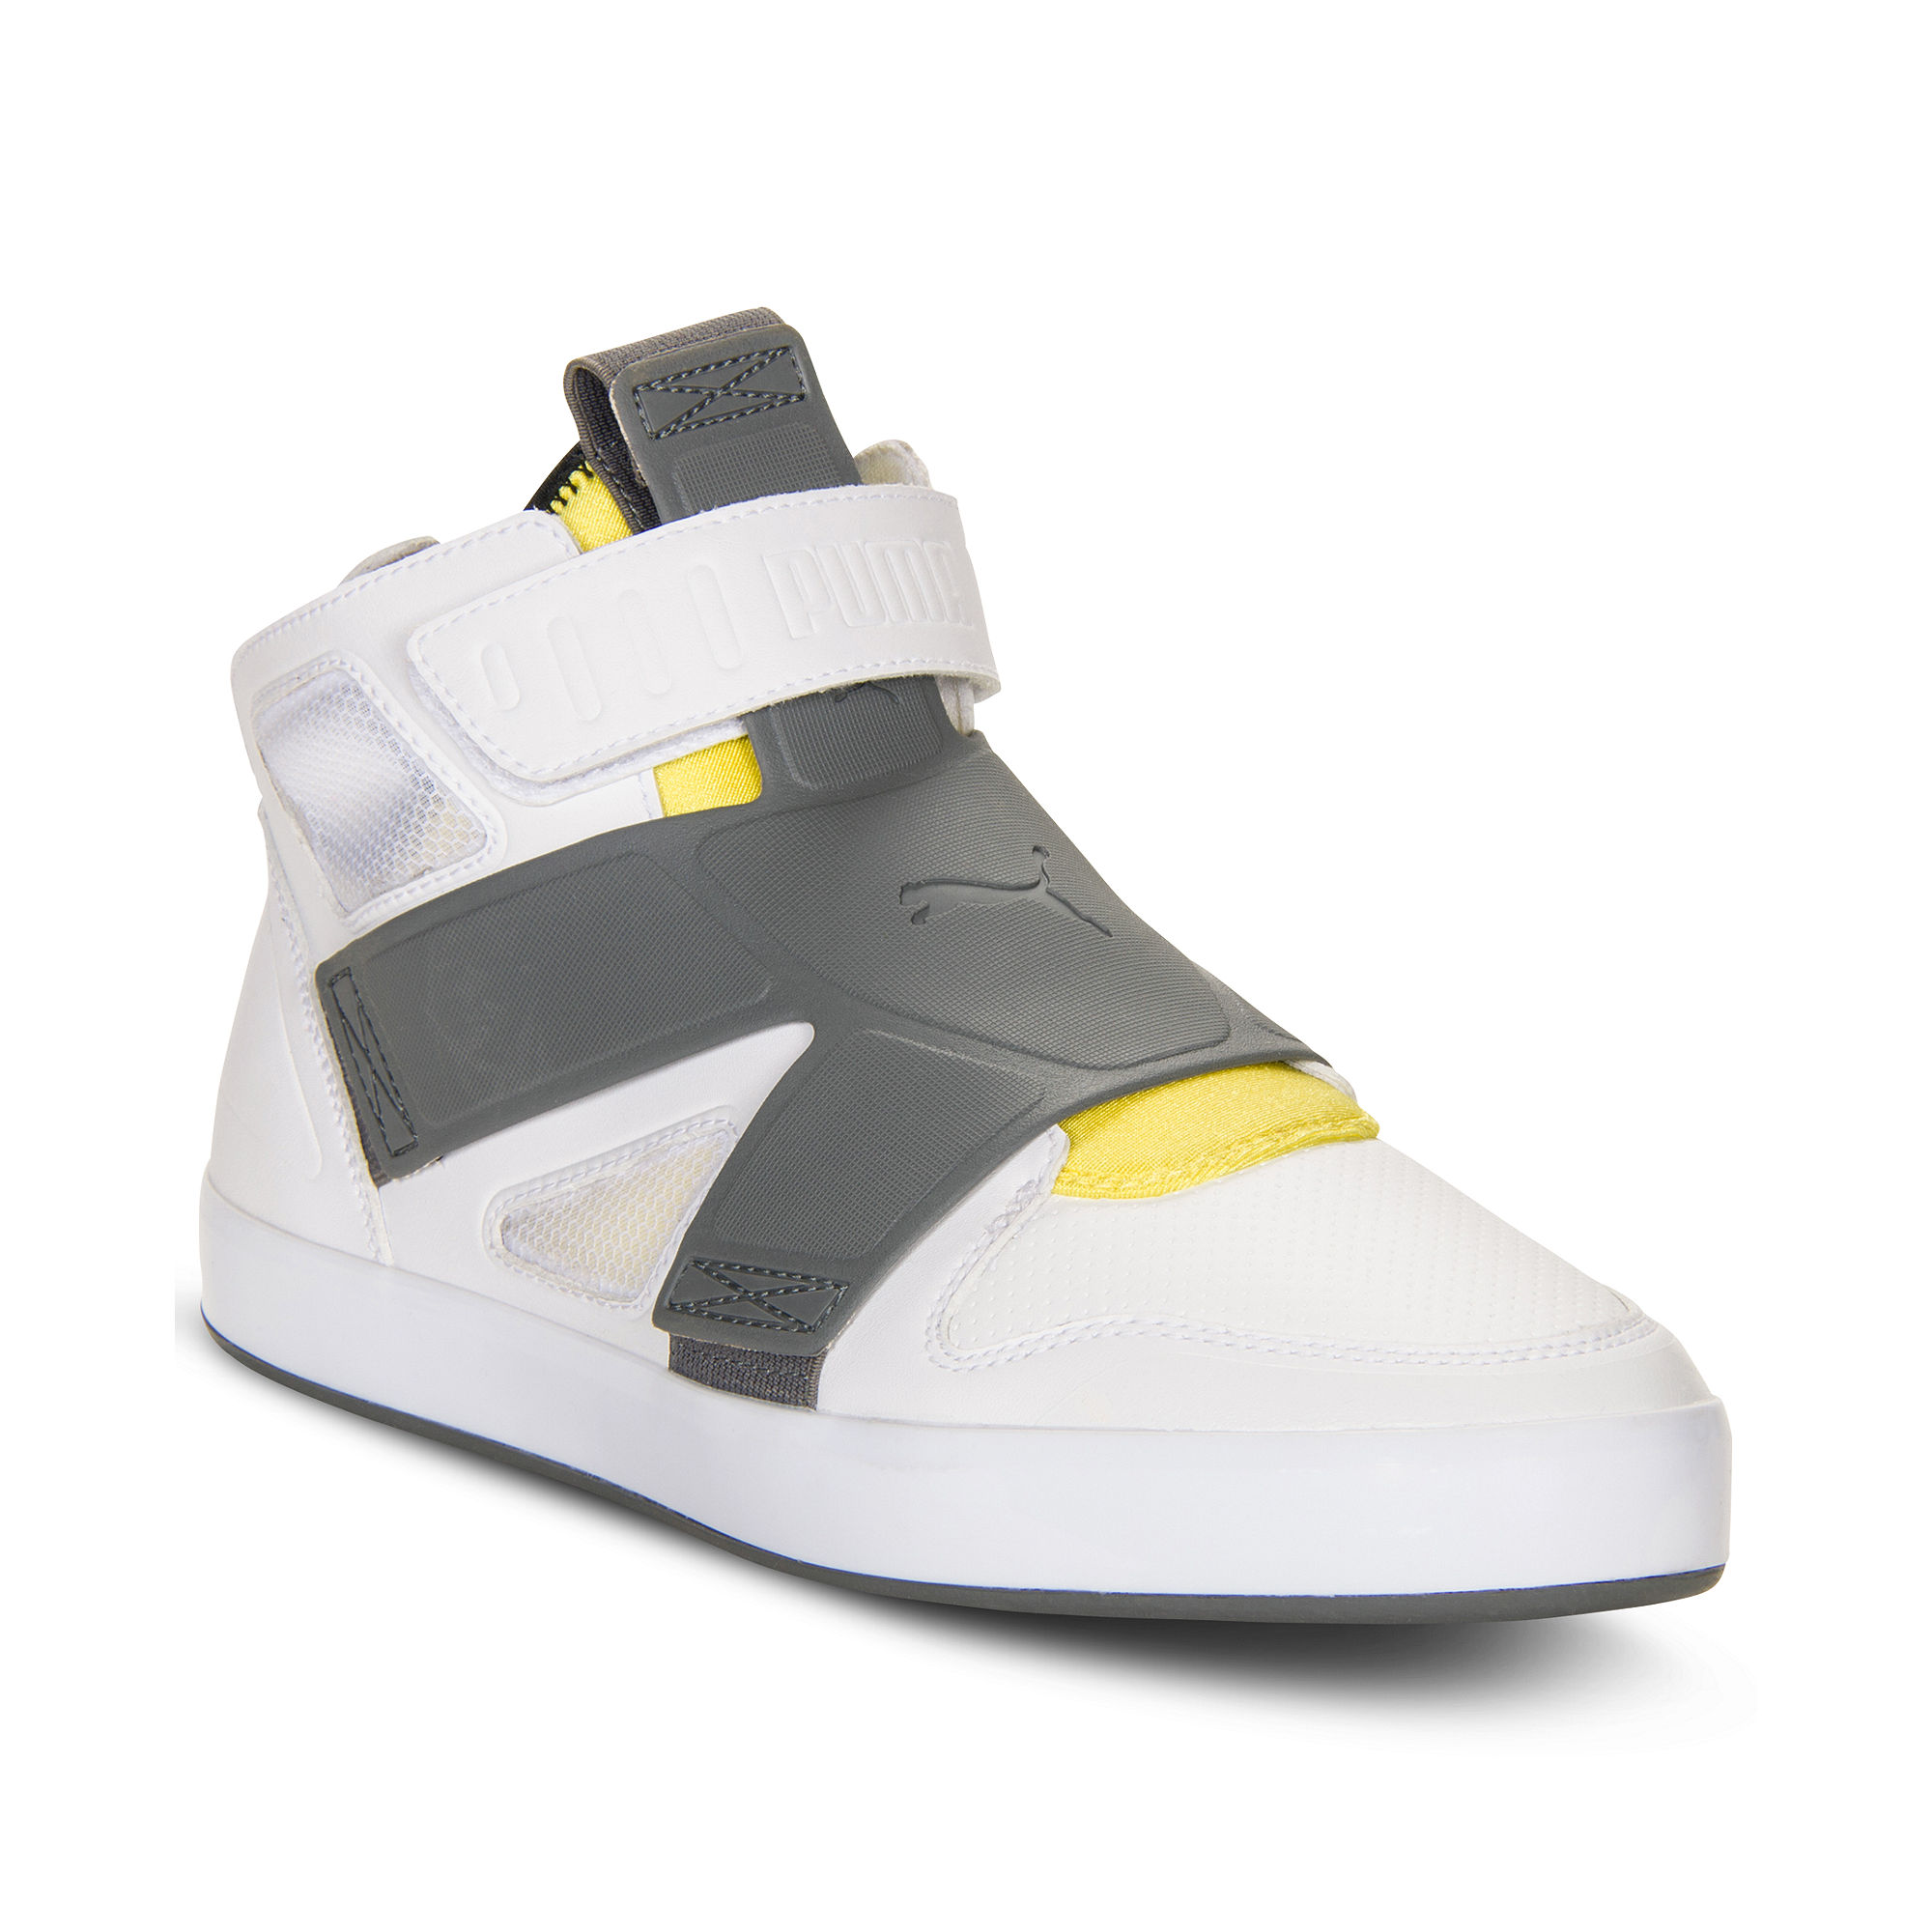 nouveau style 12149 ffe5c PUMA - White El Rey Future Sneakers for Men - Lyst